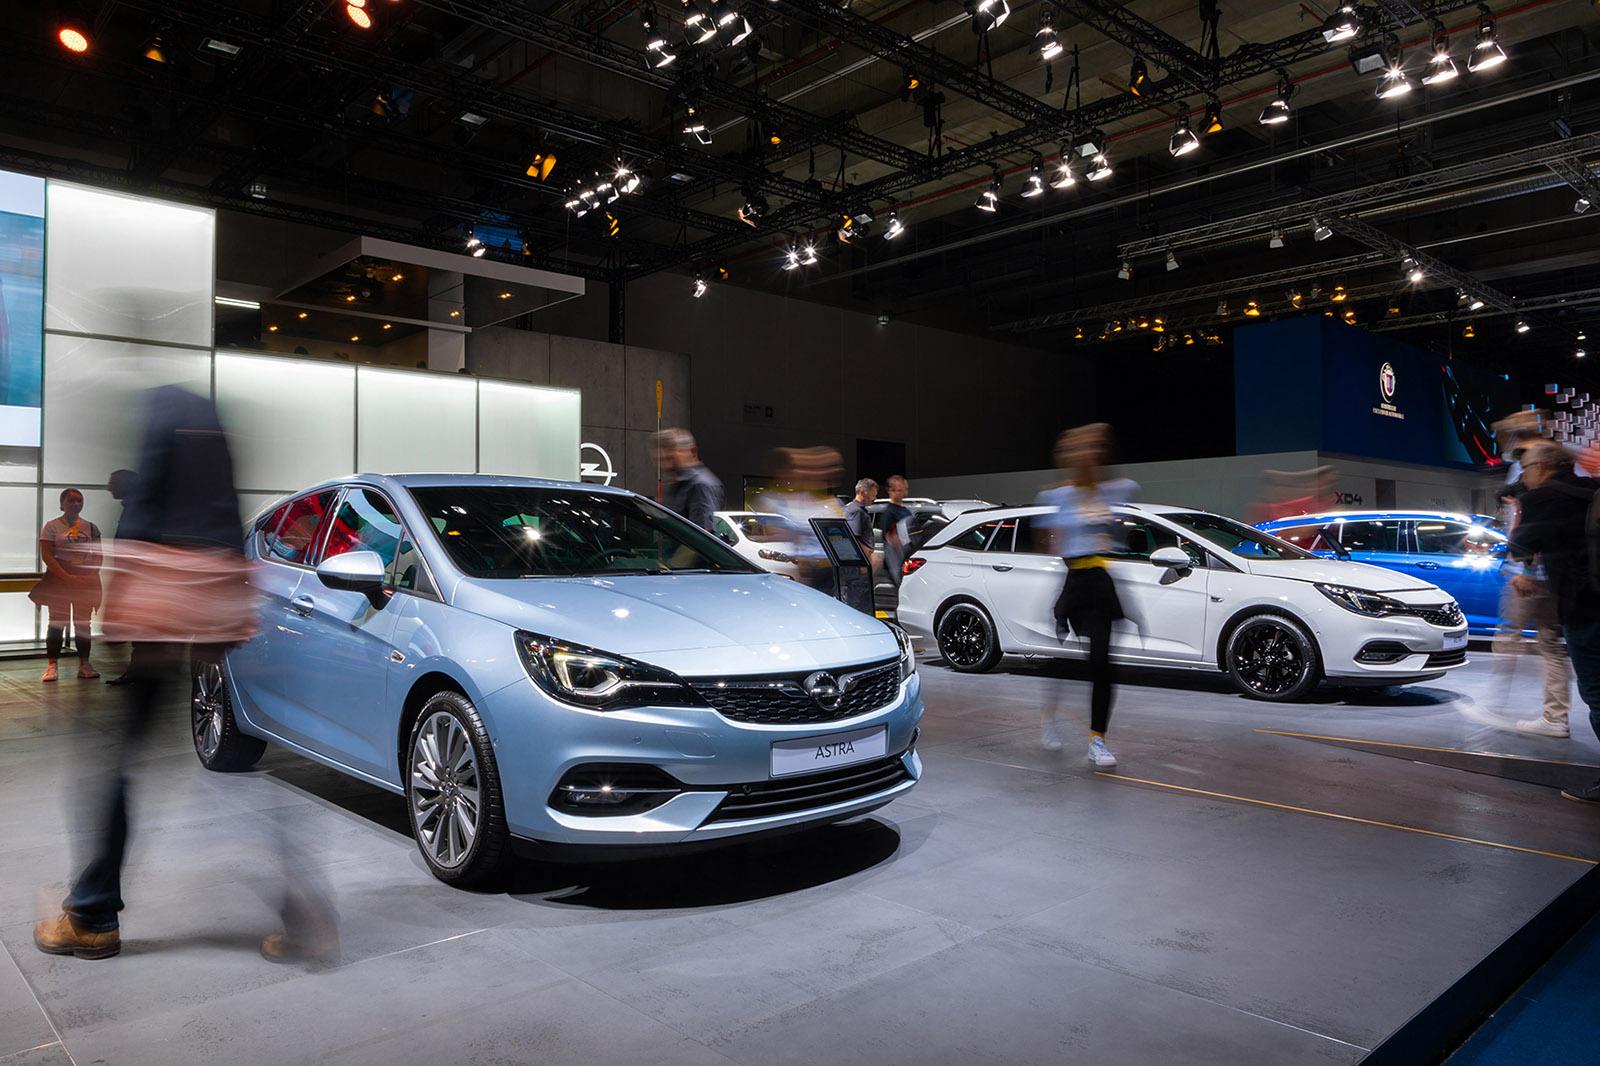 2020 Opel Astra Namaste Car